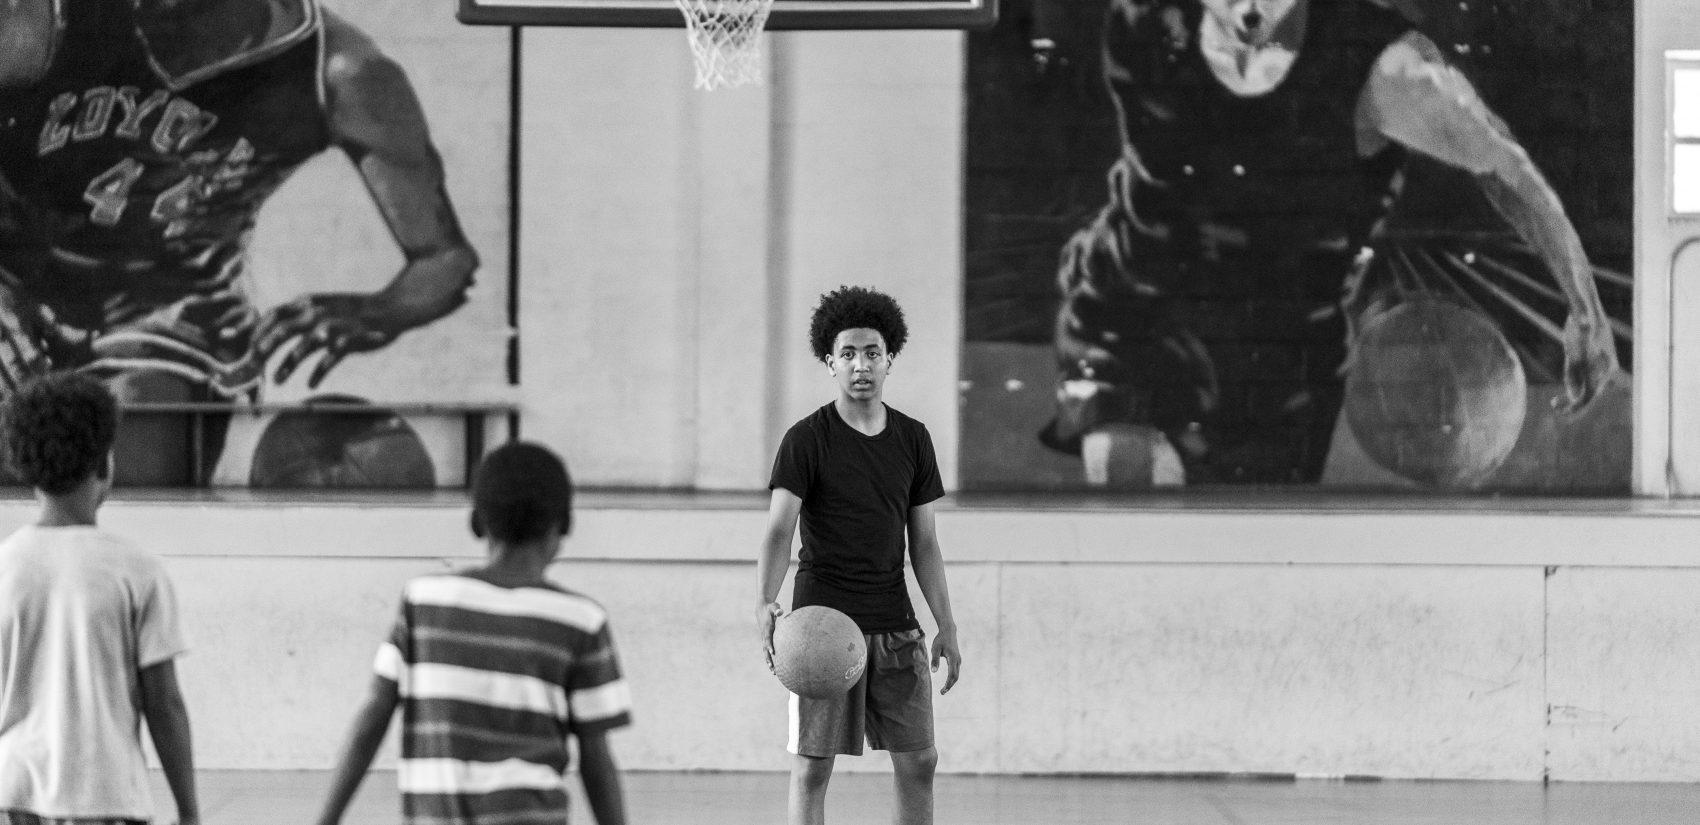 Shawn, 15, inside the Hank Gathers Rec Center gym. (Jessica Kourkounis for Keystone Crossroads)